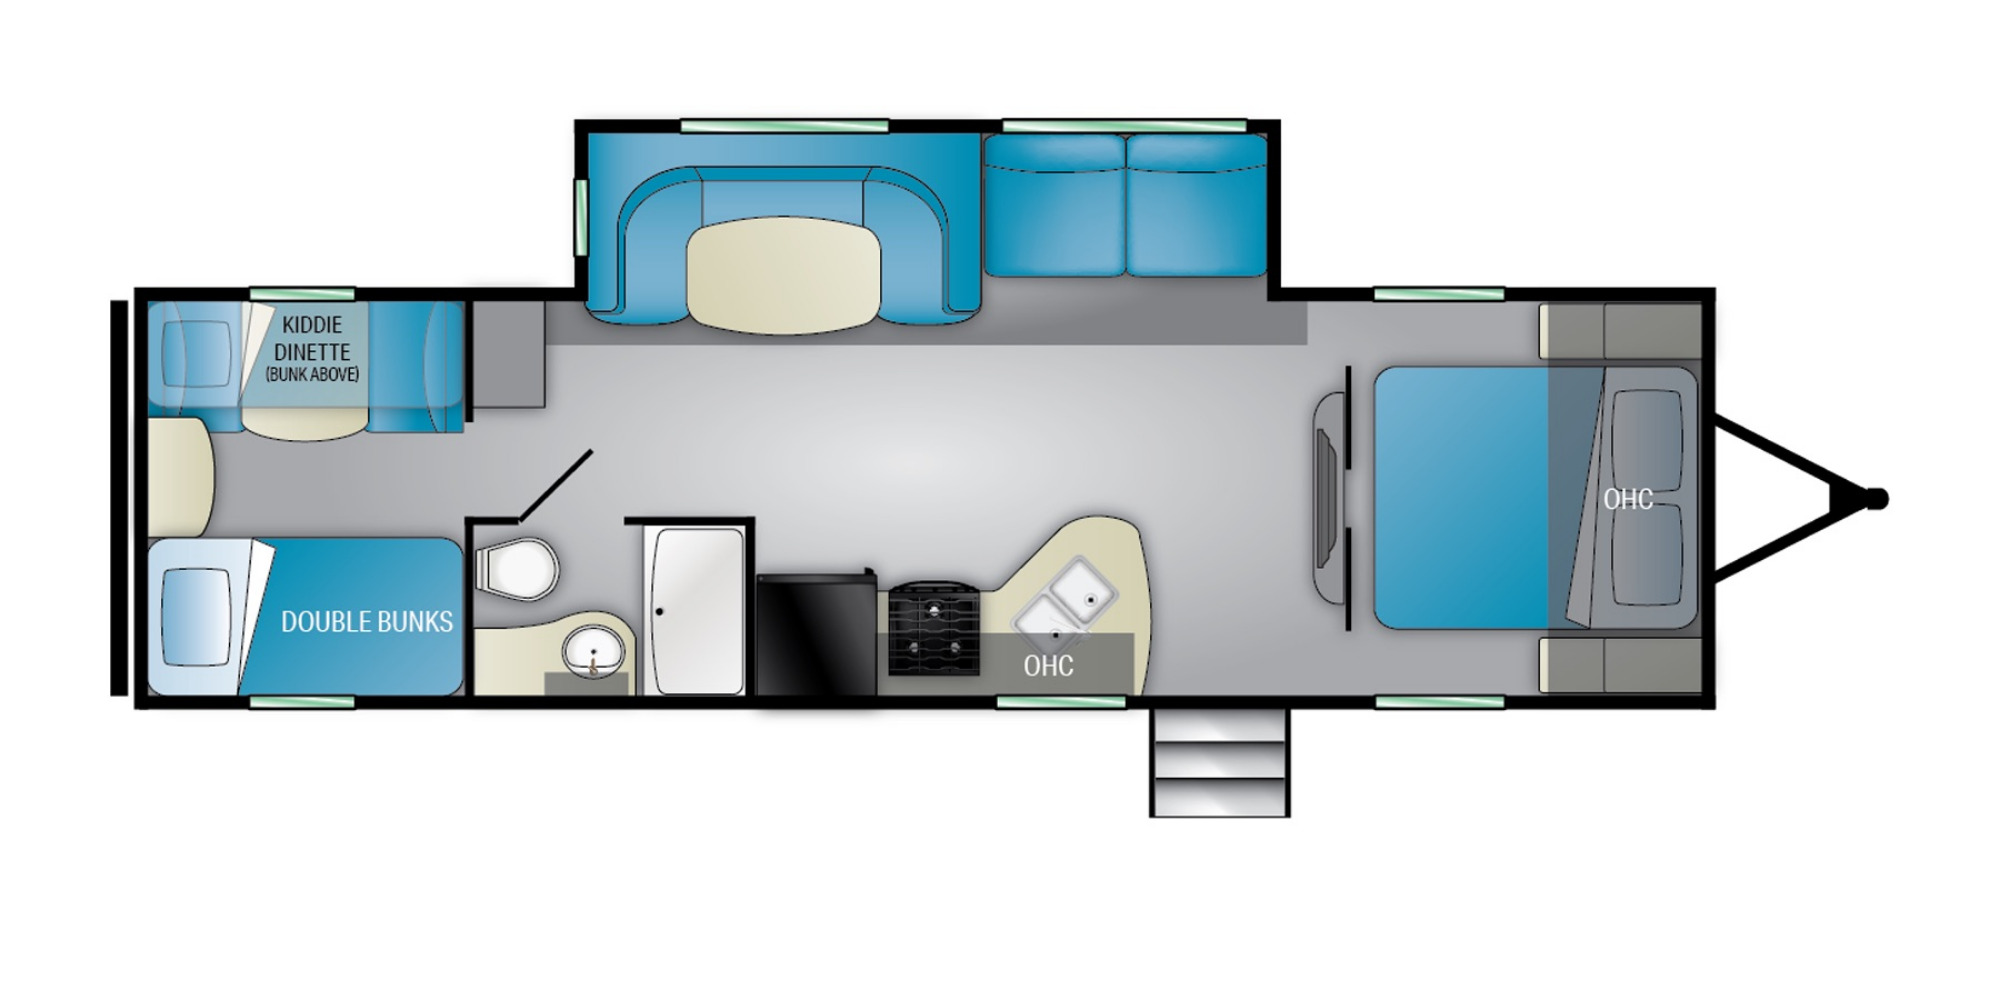 View Floor Plan for 2022 HEARTLAND PIONEER QB300